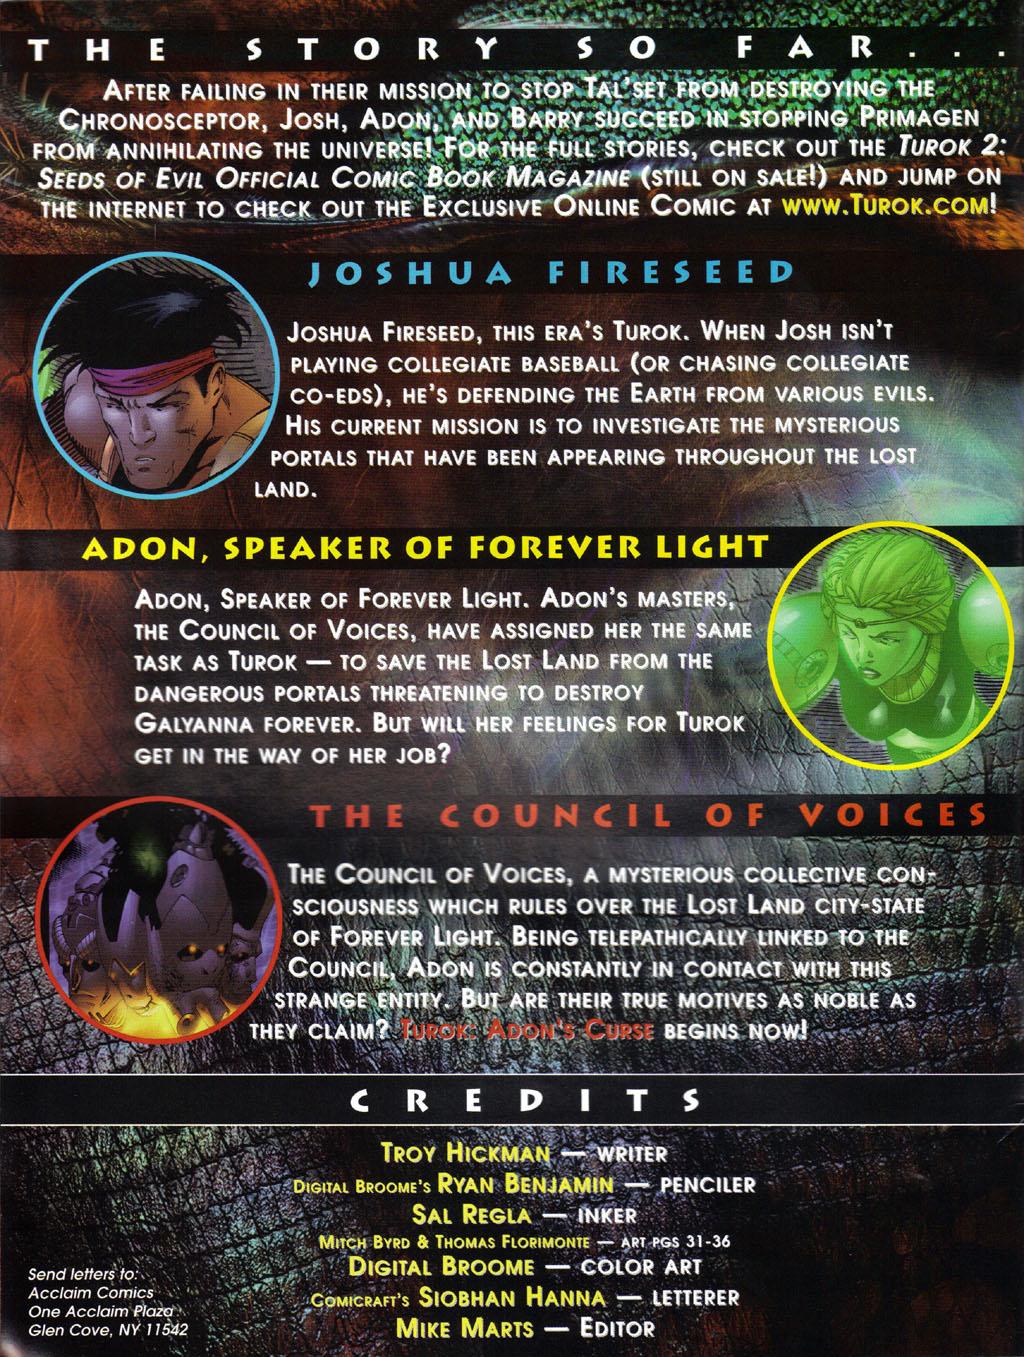 Read online Turok 2: Adon's Curse comic -  Issue # Full - 3